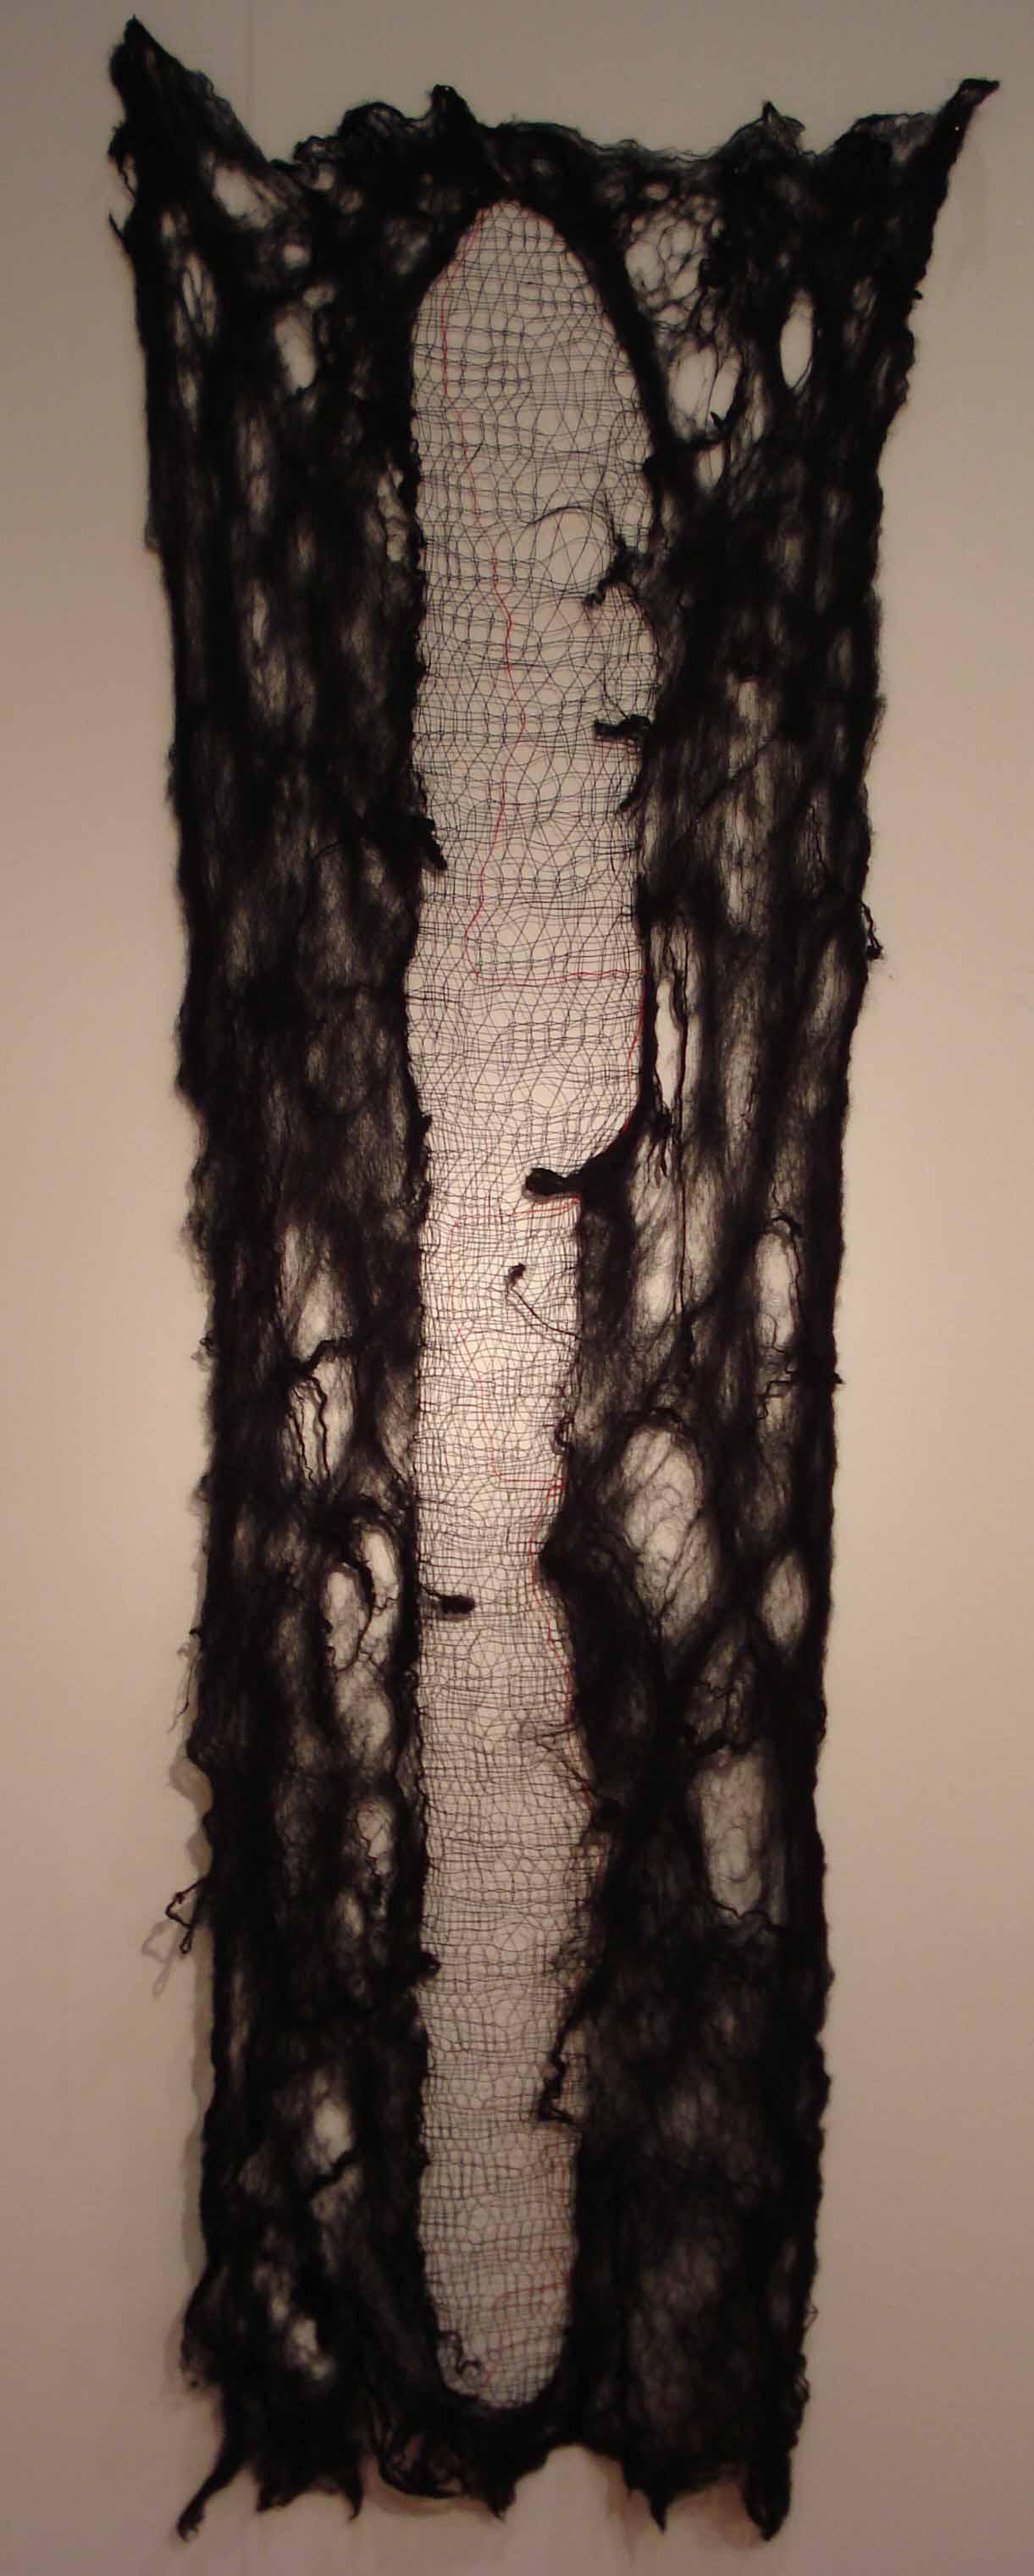 Cover cloth